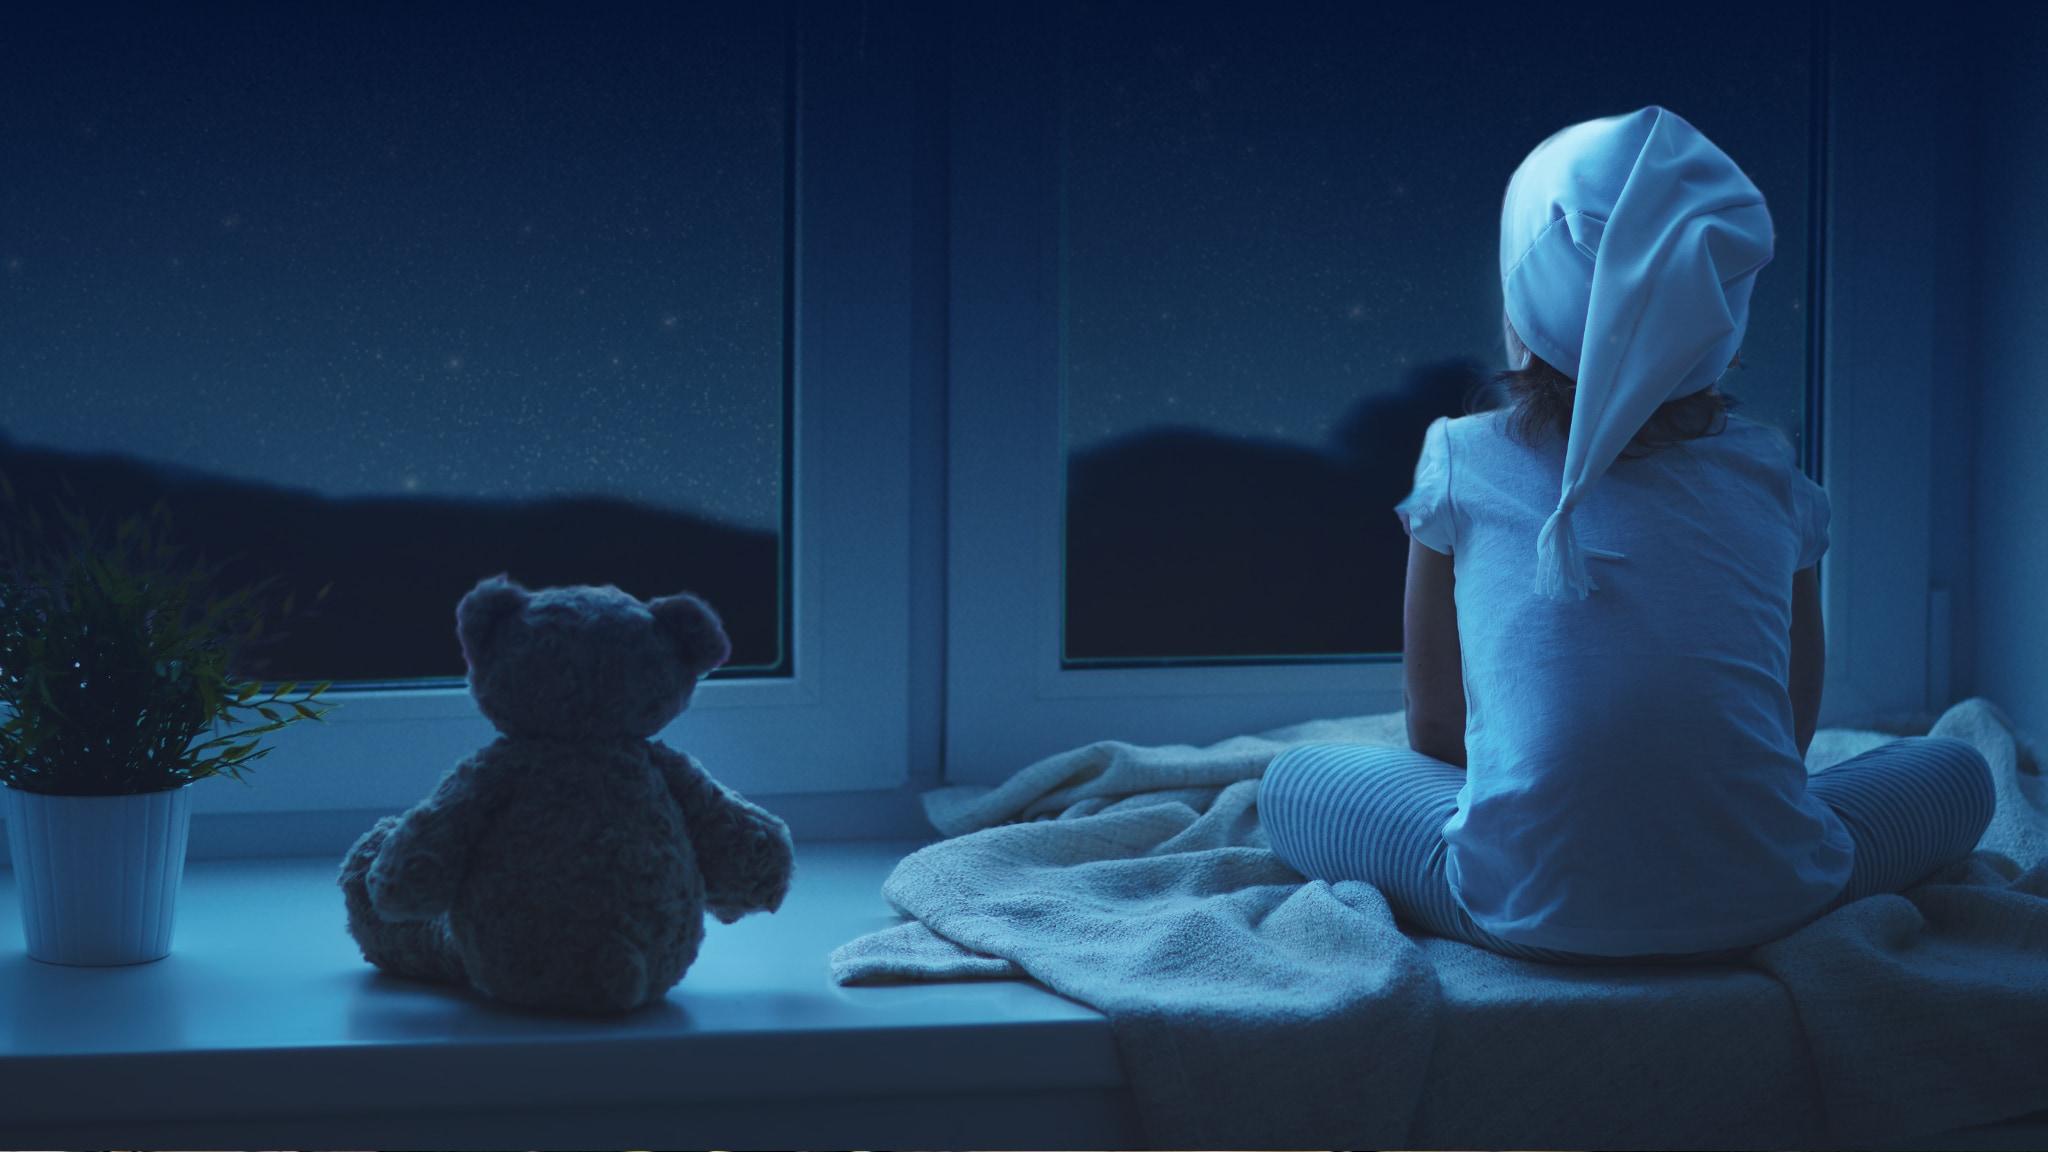 Rai Yoyo Tutti a nanna con YoYo 2021